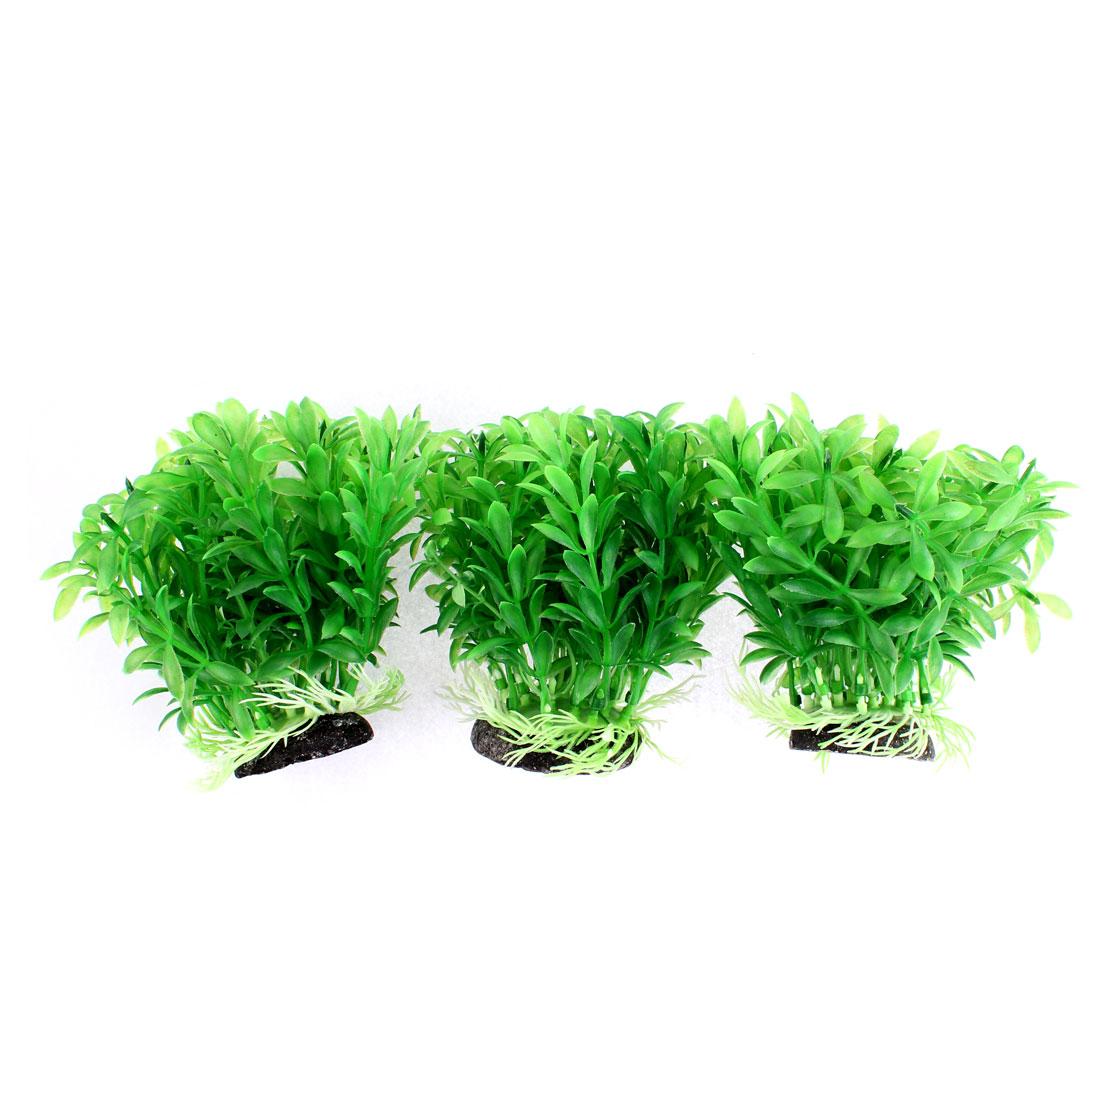 Aquarium Artificial Underwater Plant Grass Ornament 11cm High 3pcs